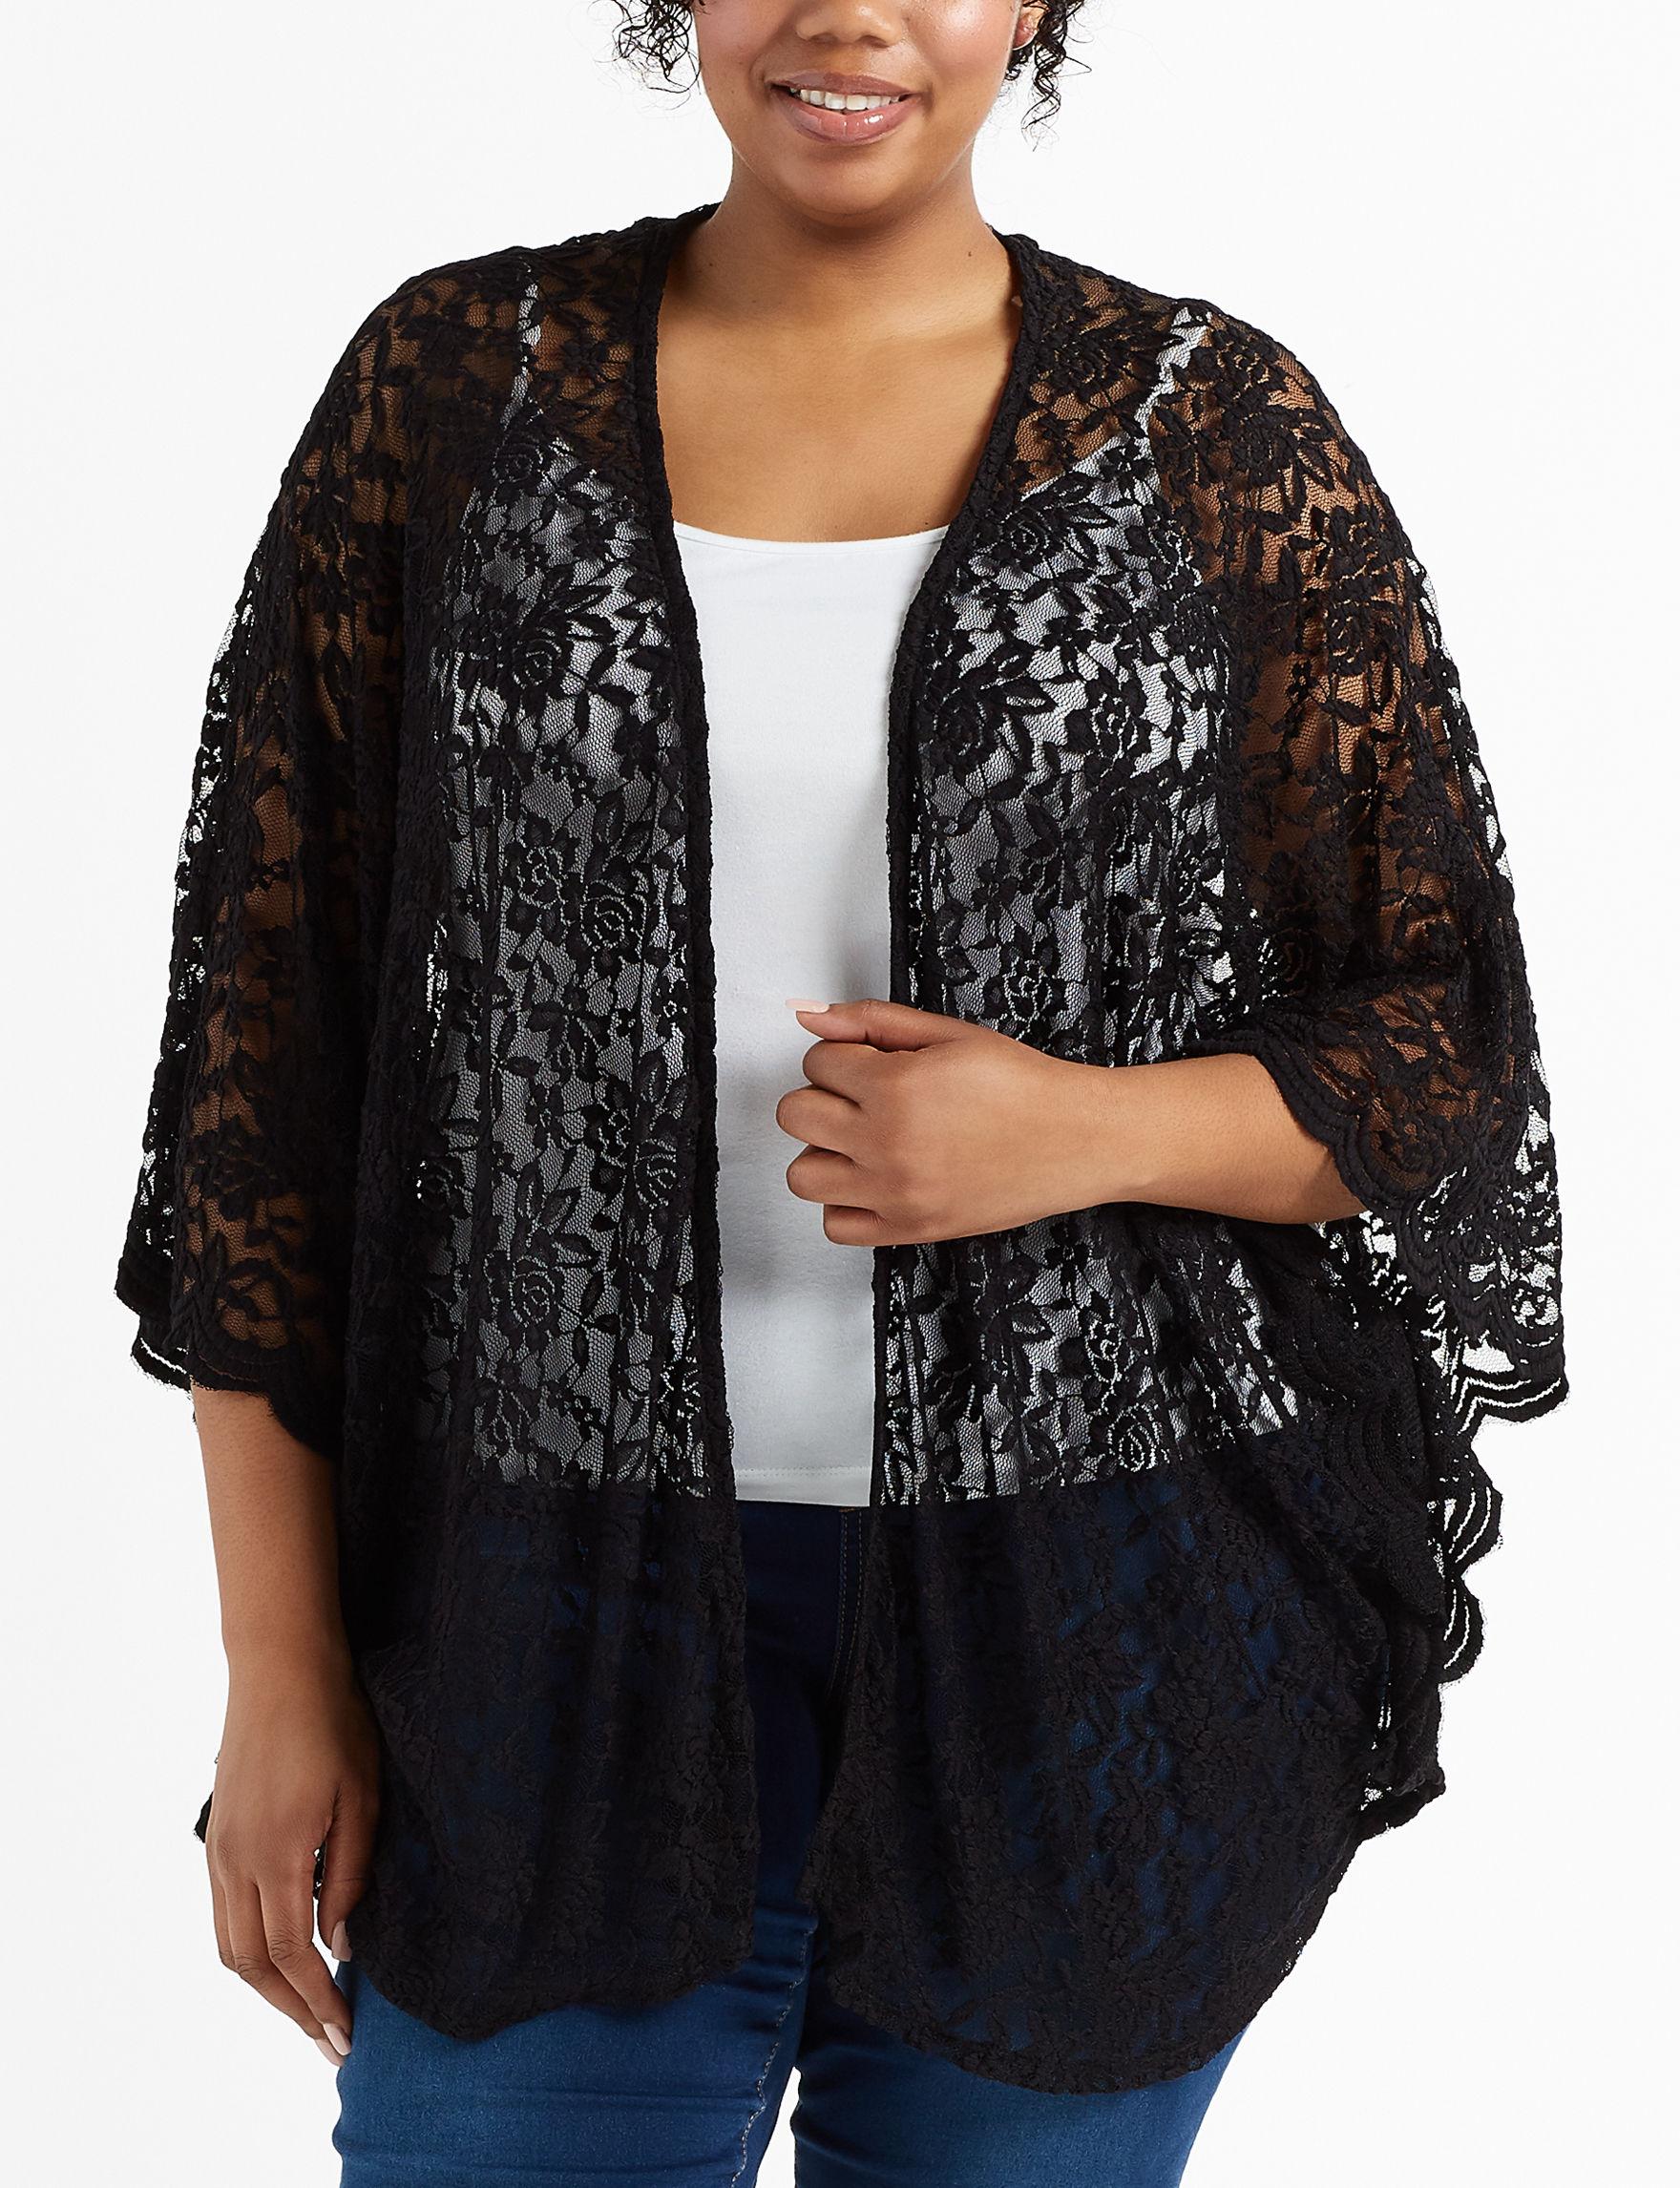 Liberty Love Black Kimonos & Toppers